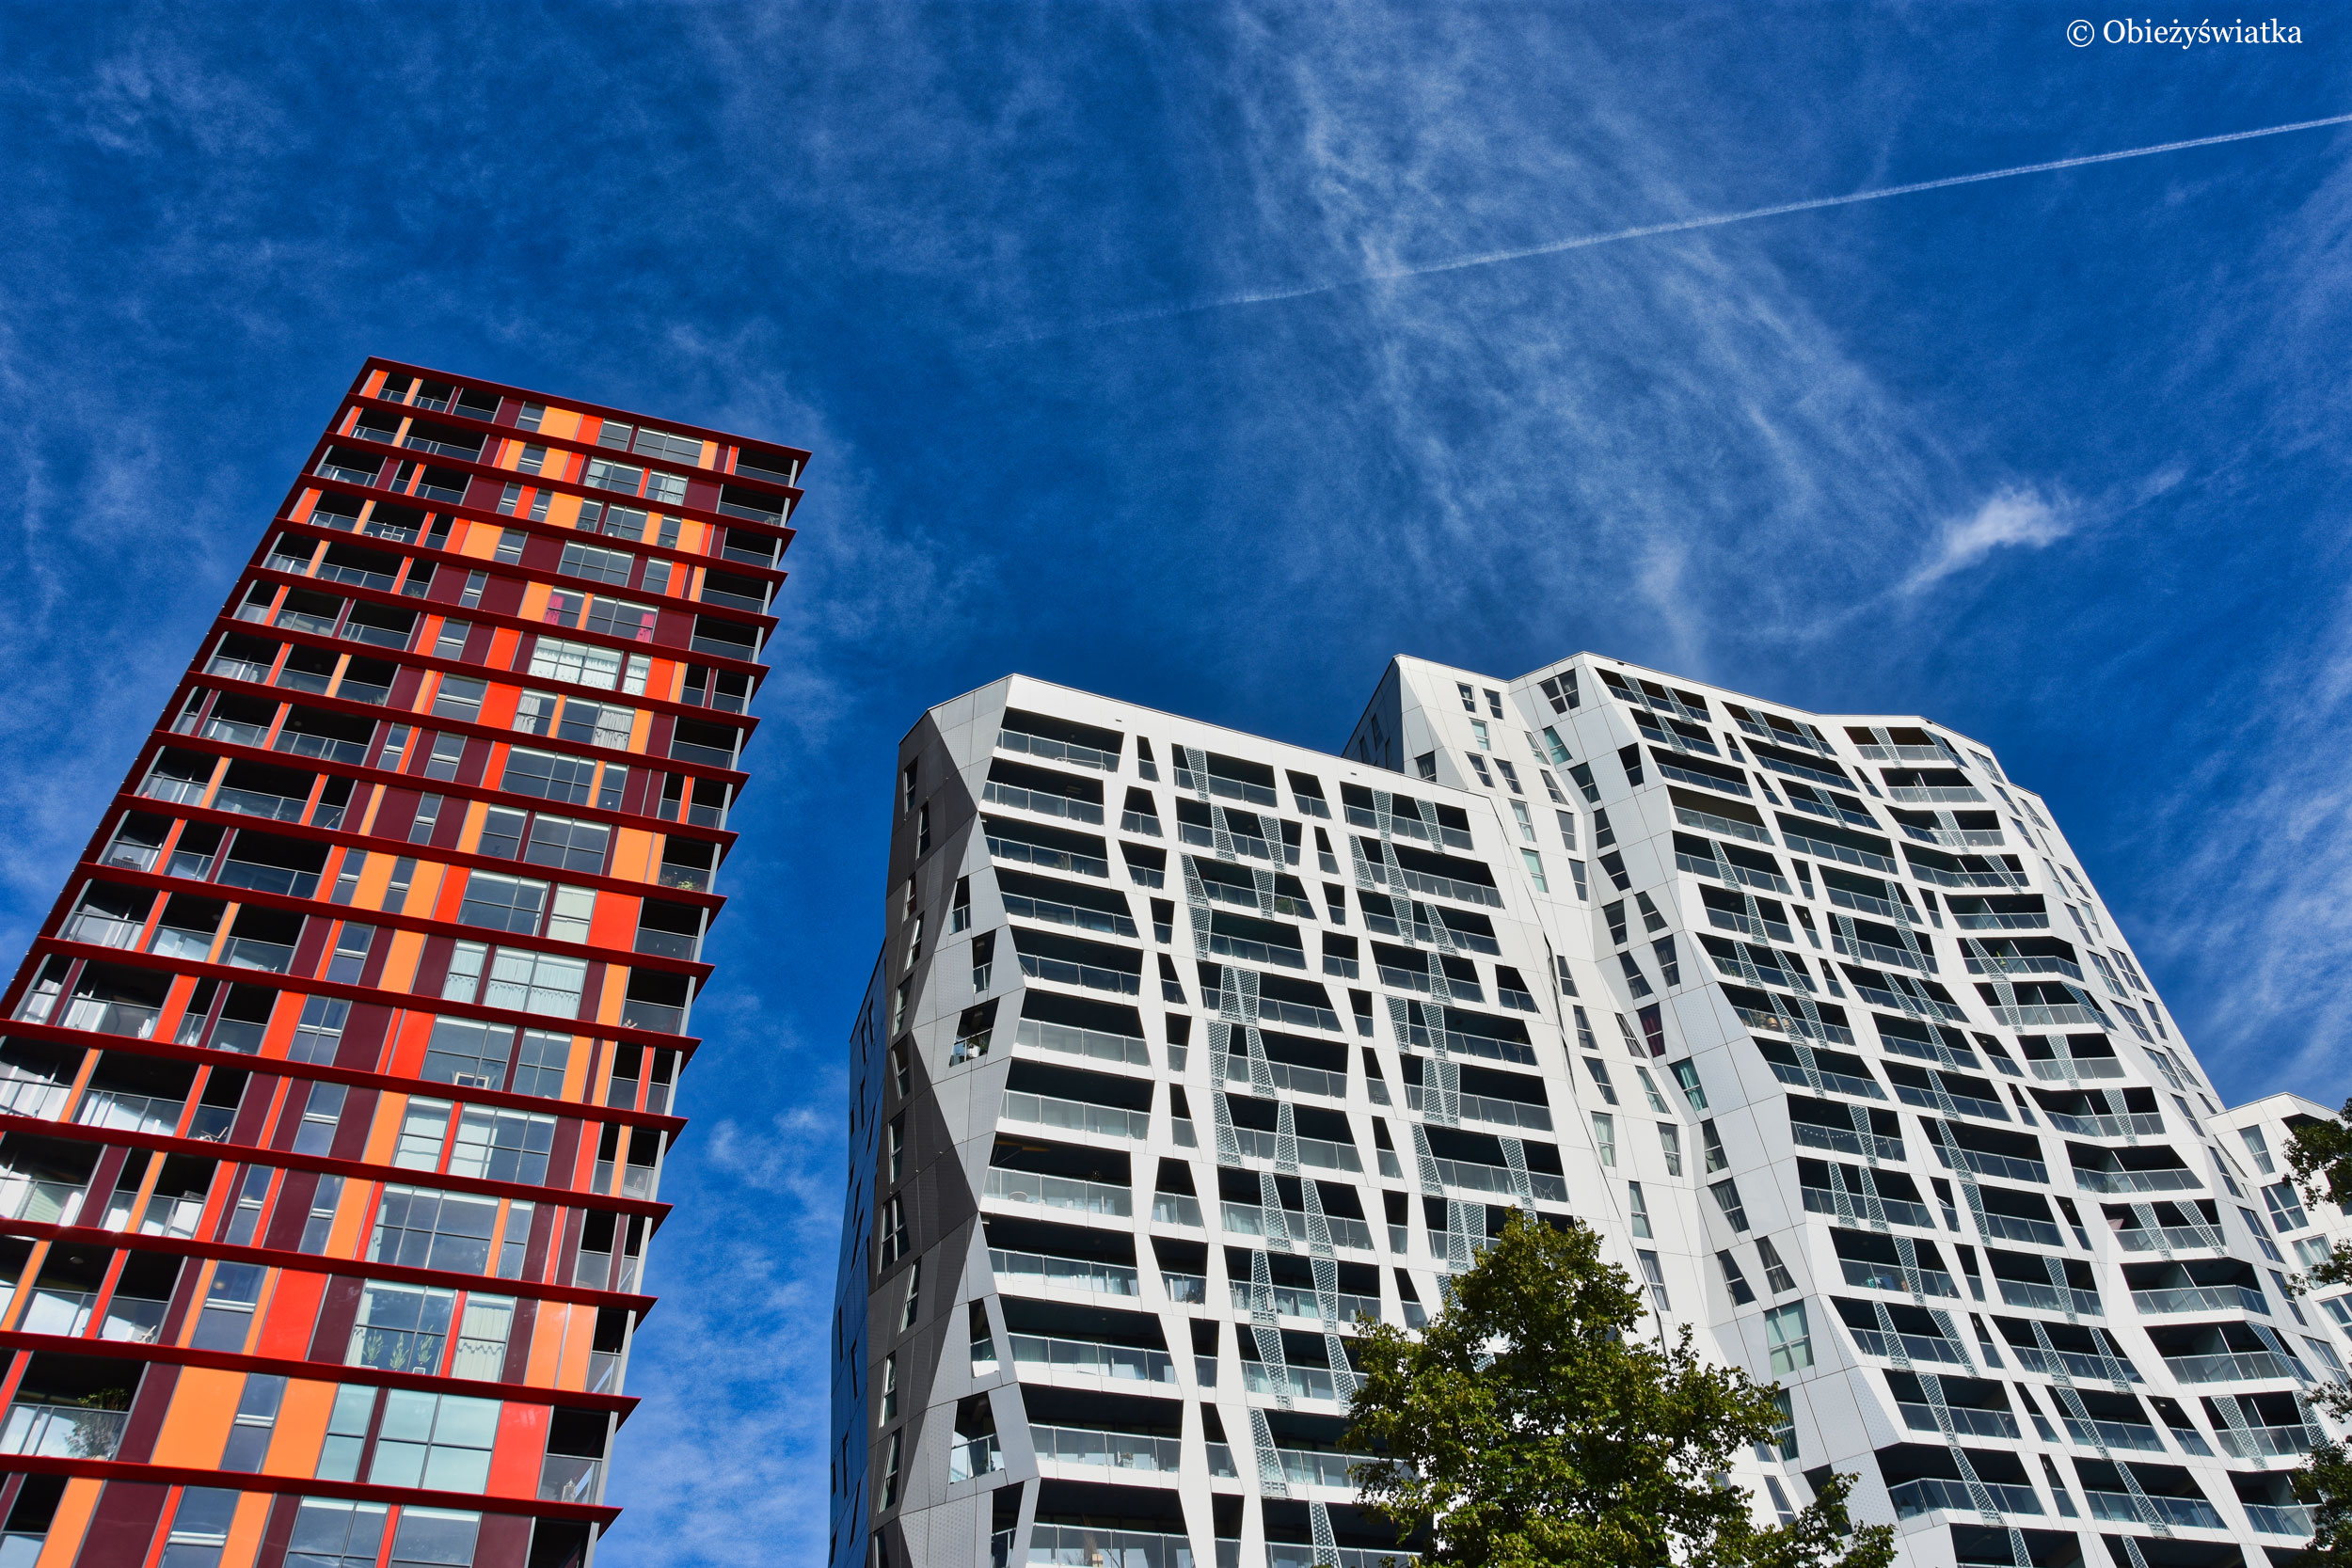 Złamana linia - Calypso, Rotterdam